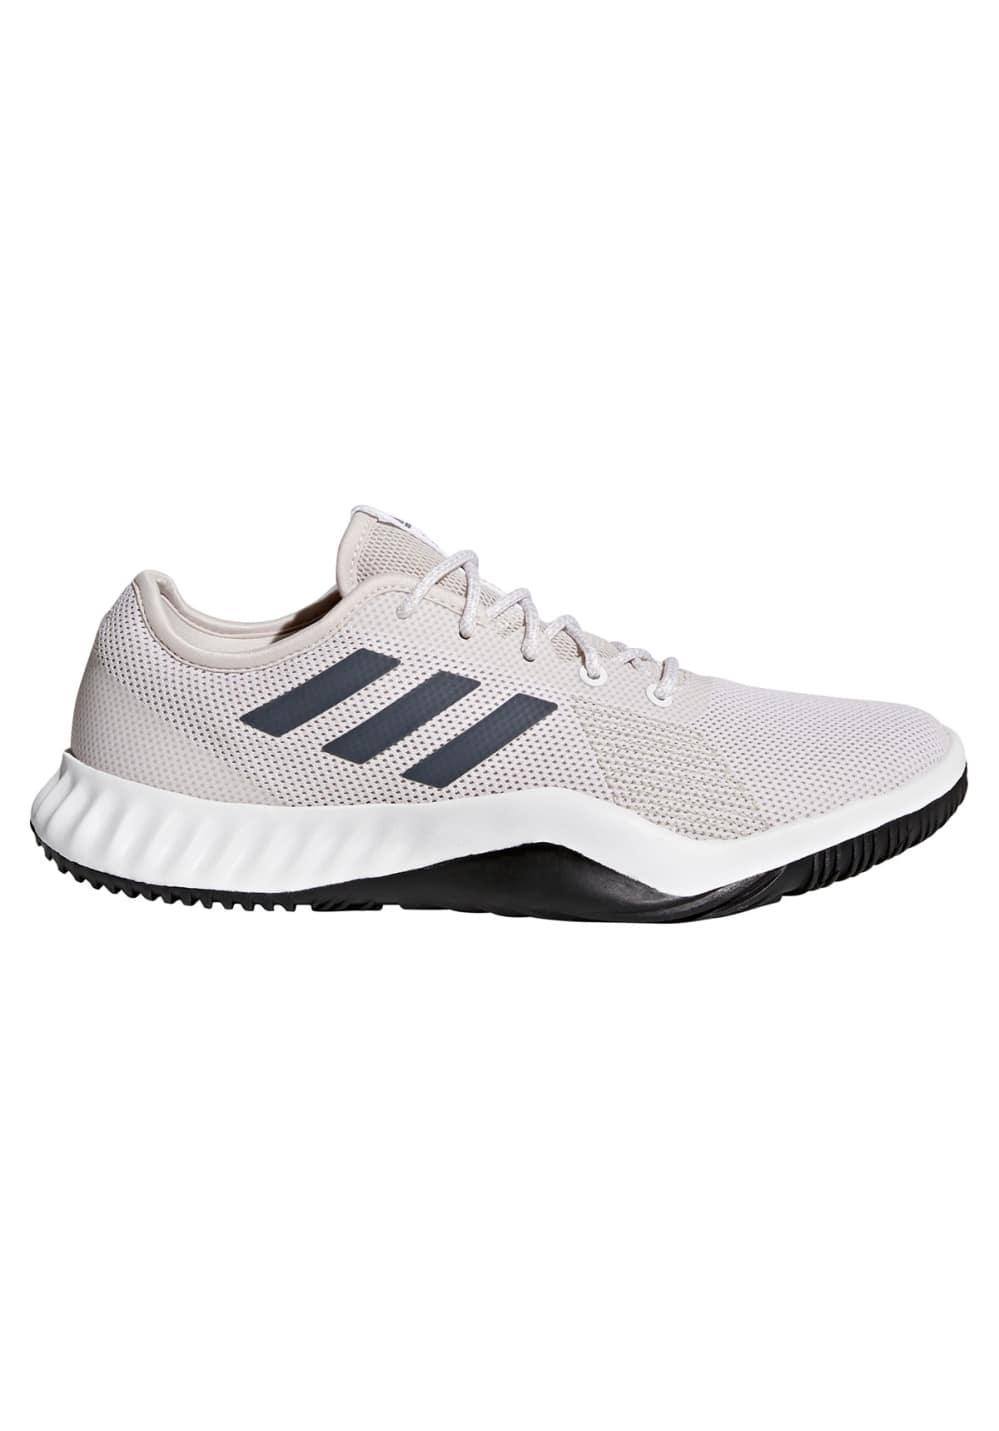 adidas Crazytrain Lt Chaussures fitness pour Homme Blanc